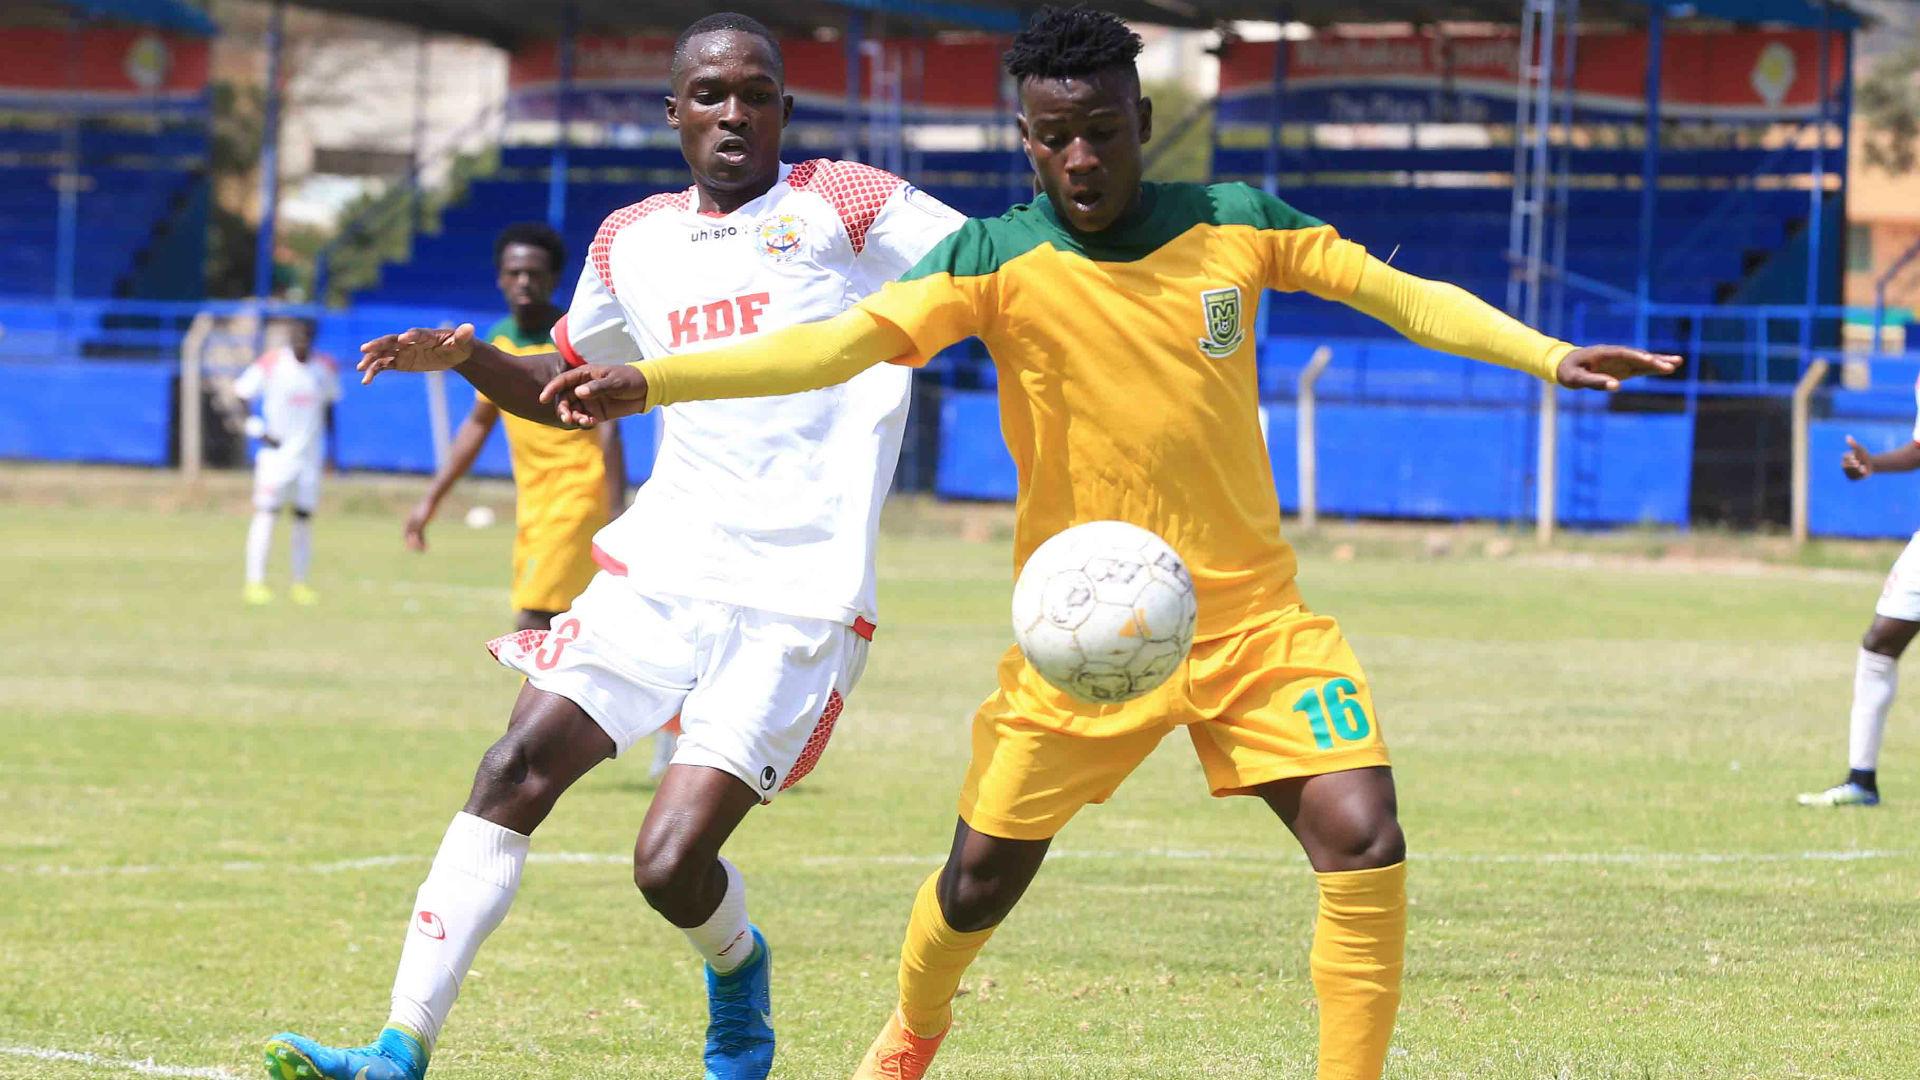 Mathare United 2-1 Ulinzi Stars: Alwanga's late header hands Slum Boys first win